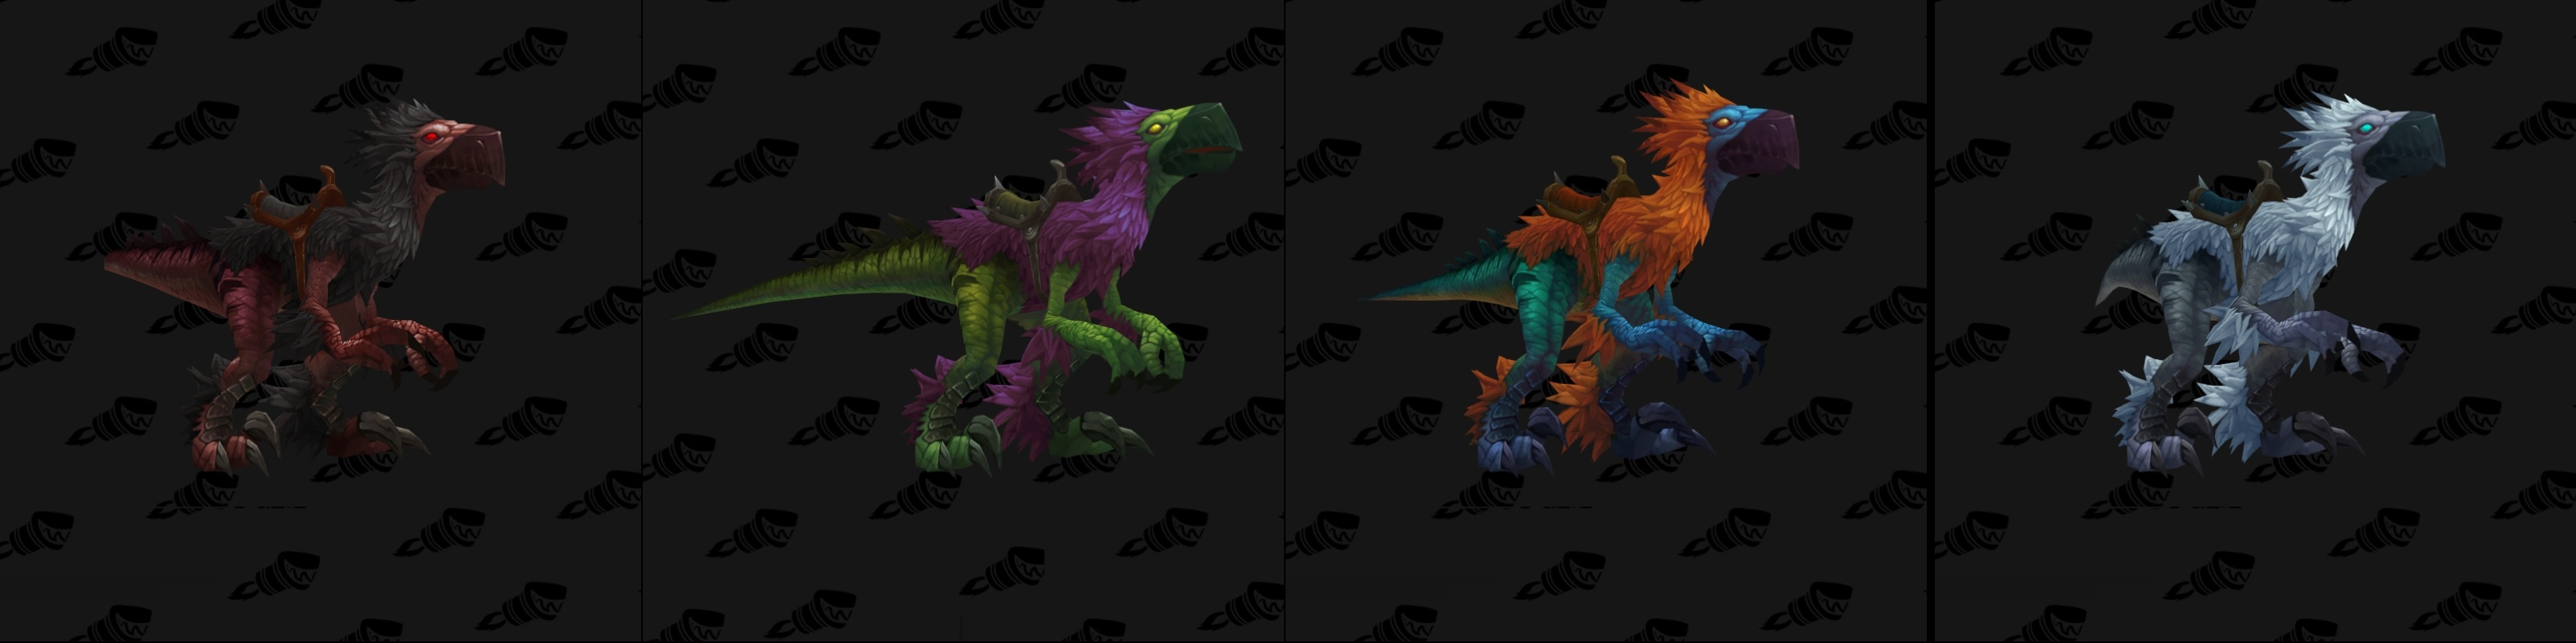 falcosauros mount